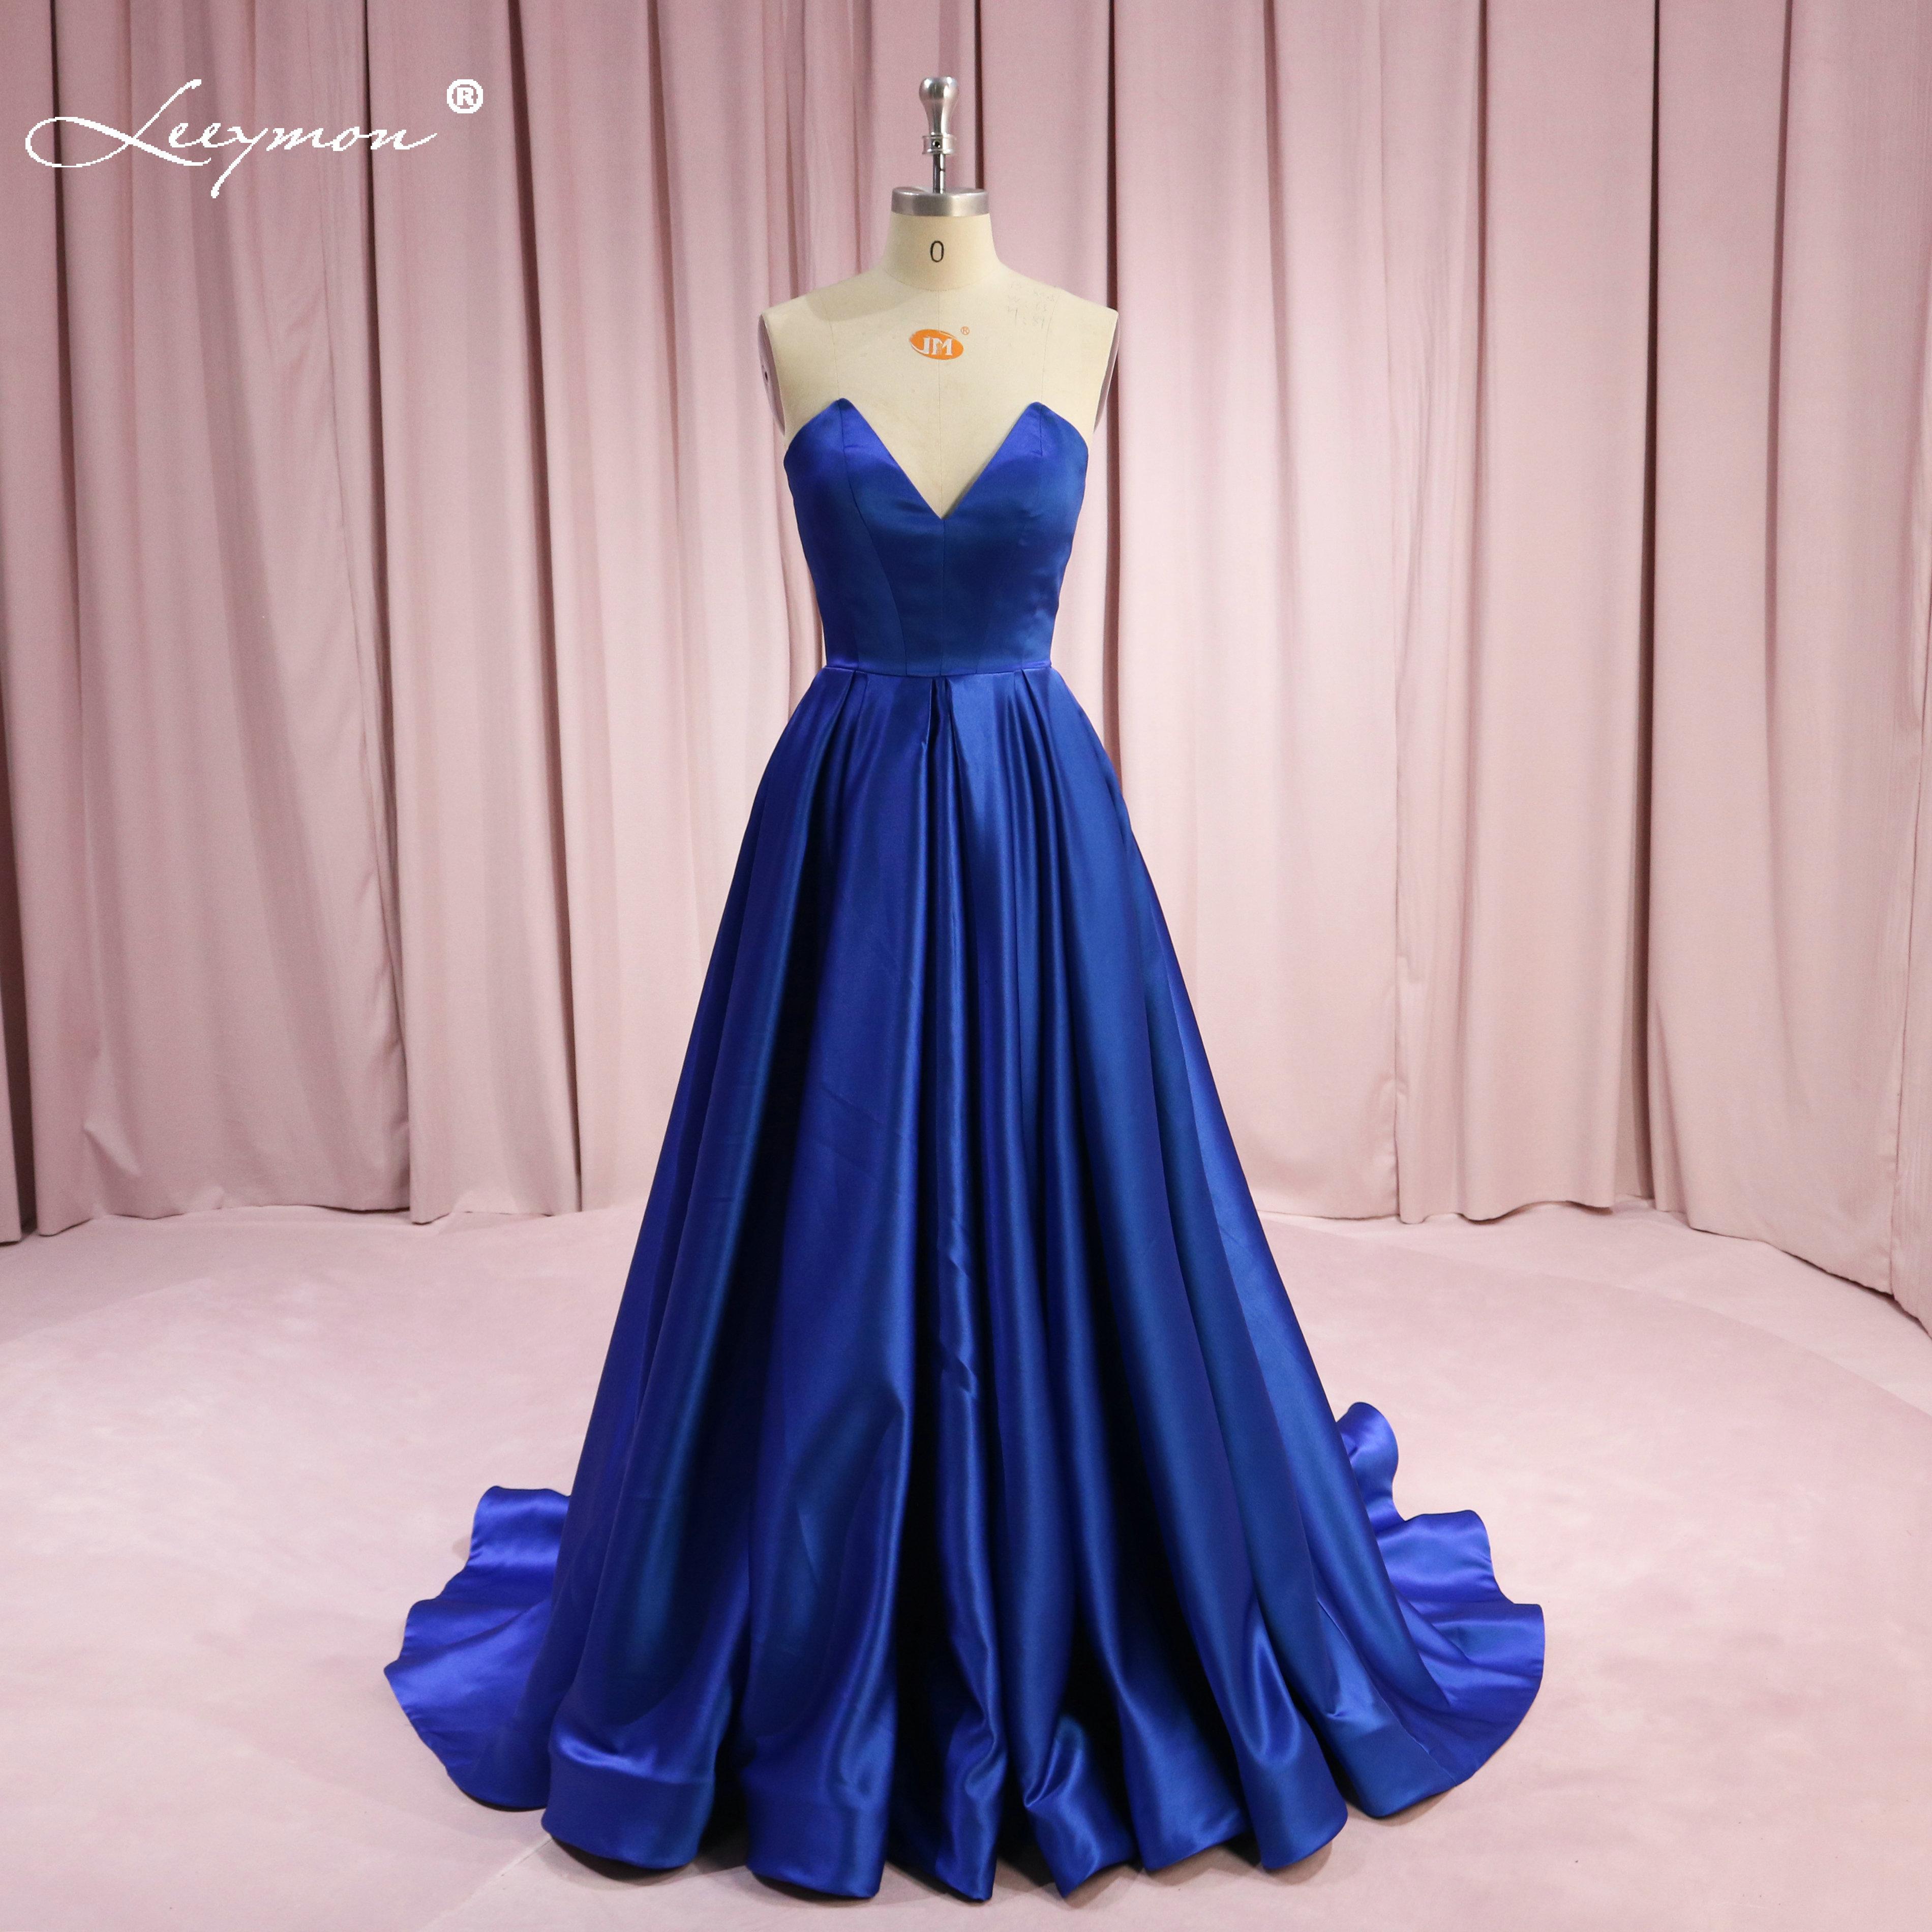 Leeymon A-line Satin Evening Dress Sweetheart Strapless Royal Blue Long Evening Gown Vestido De Festa Floor-Length